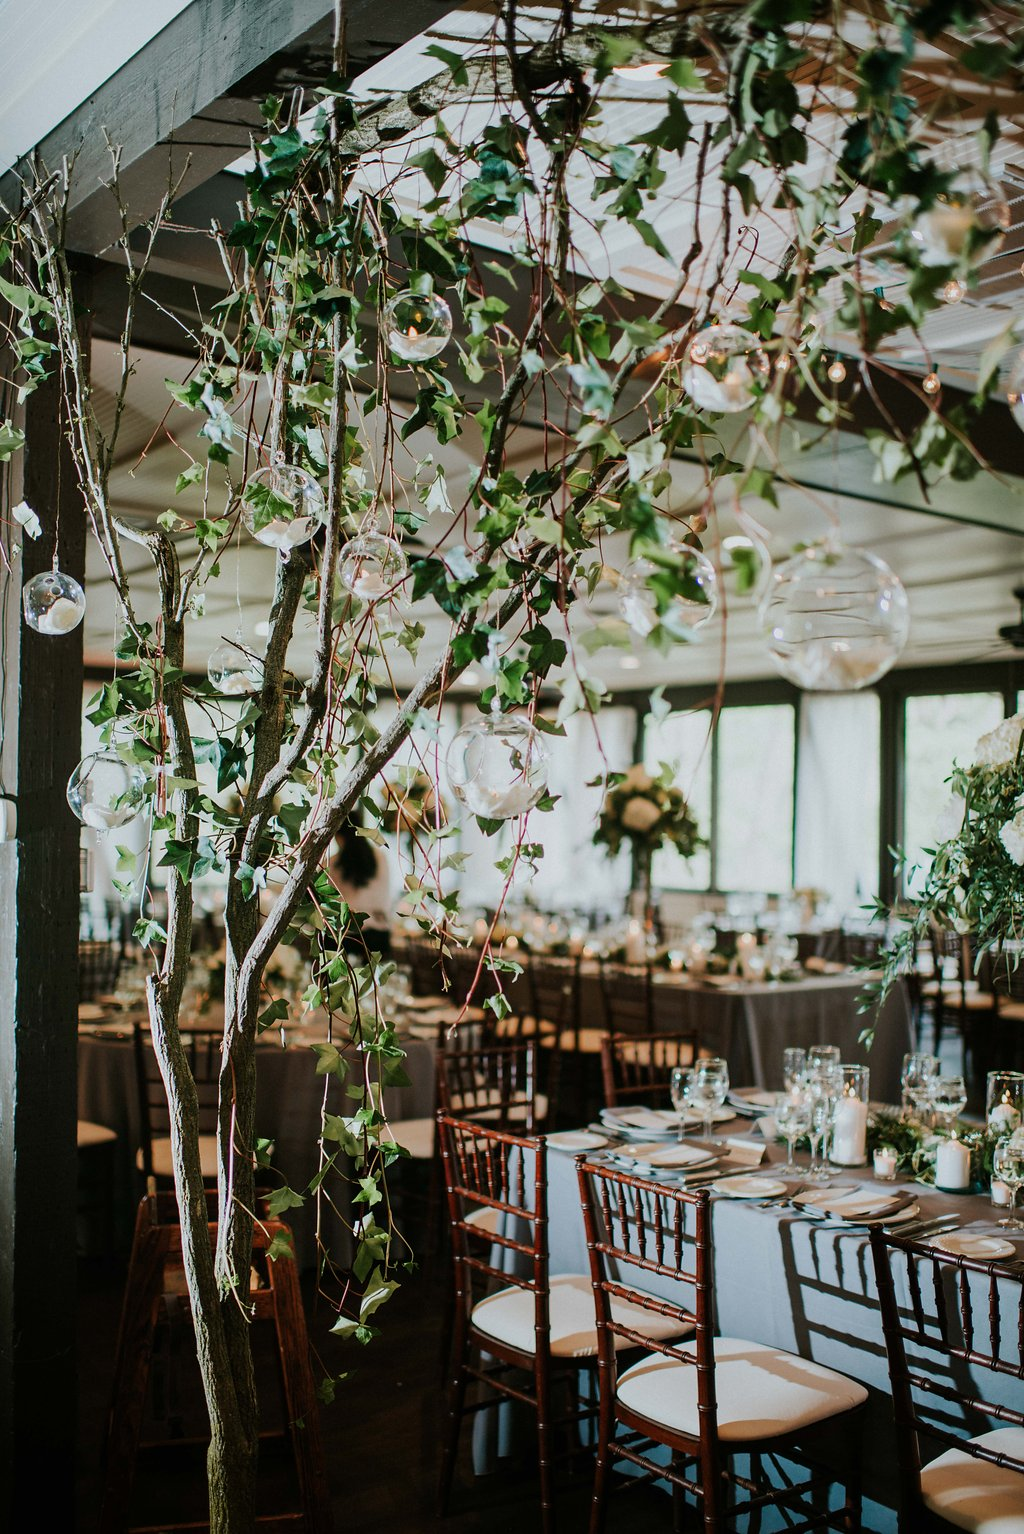 HillbrookClub_Wedding_Cleveland_Jessica+Dani_M+JPhoto-741.JPG